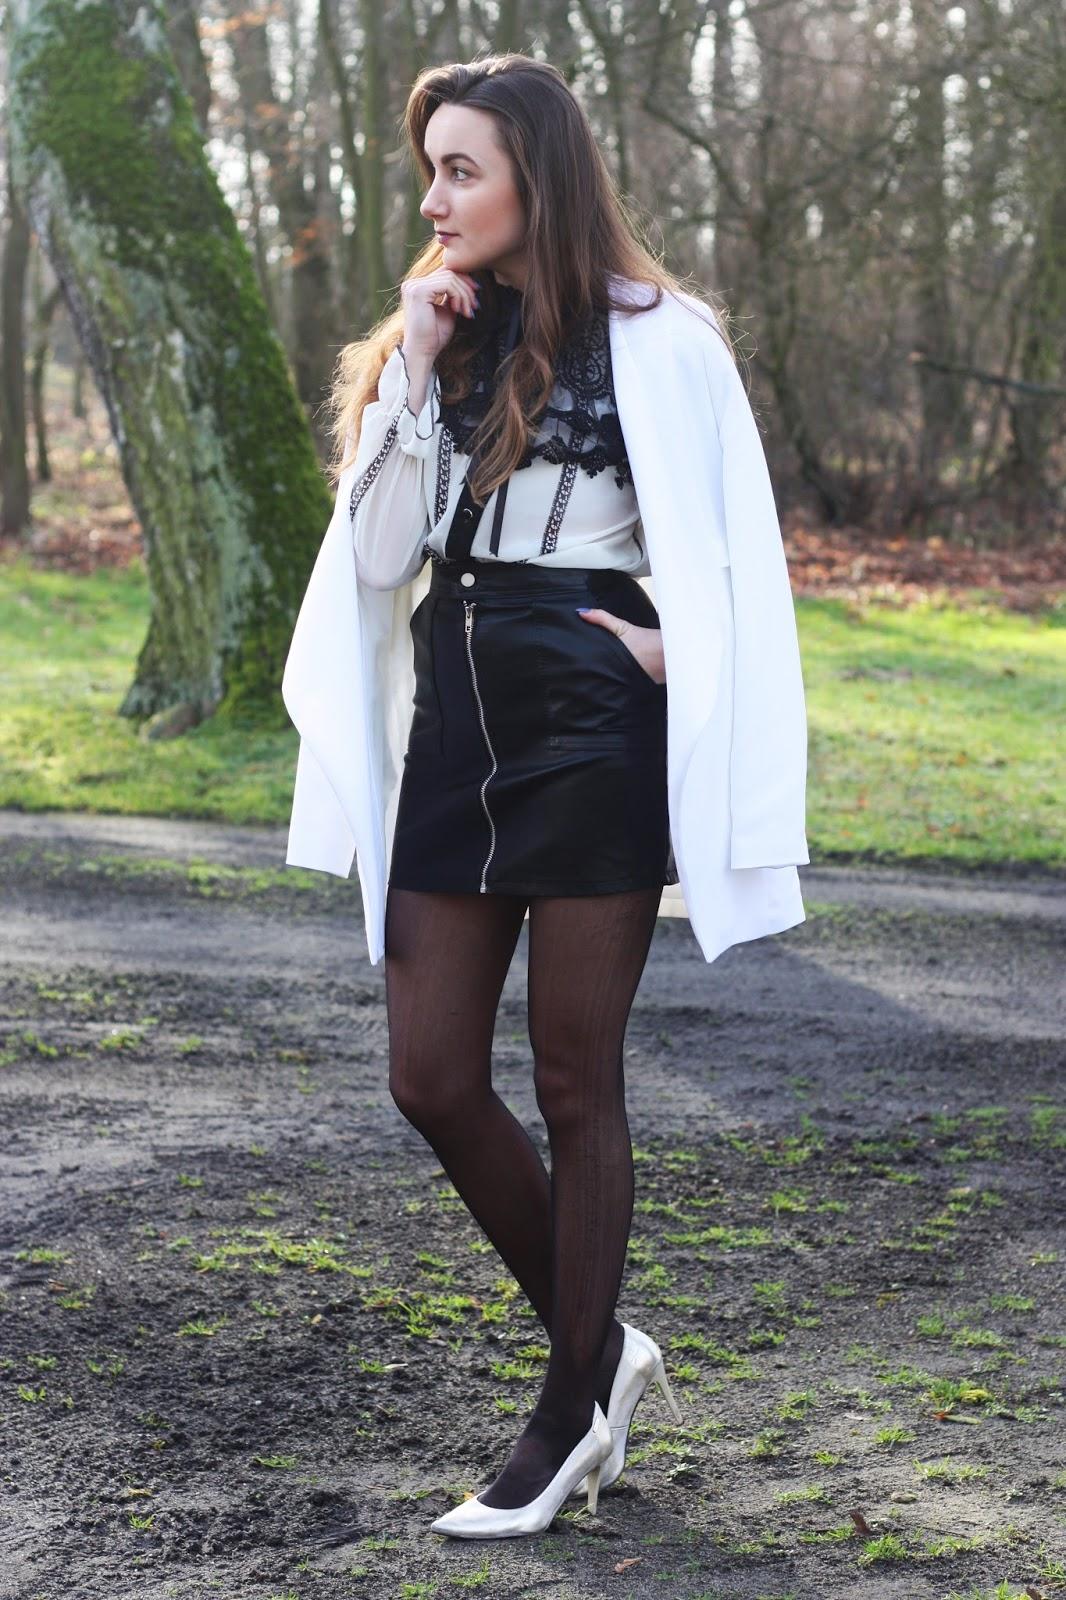 Winter Tights Inspiration Leather Skirt Fashionmylegs